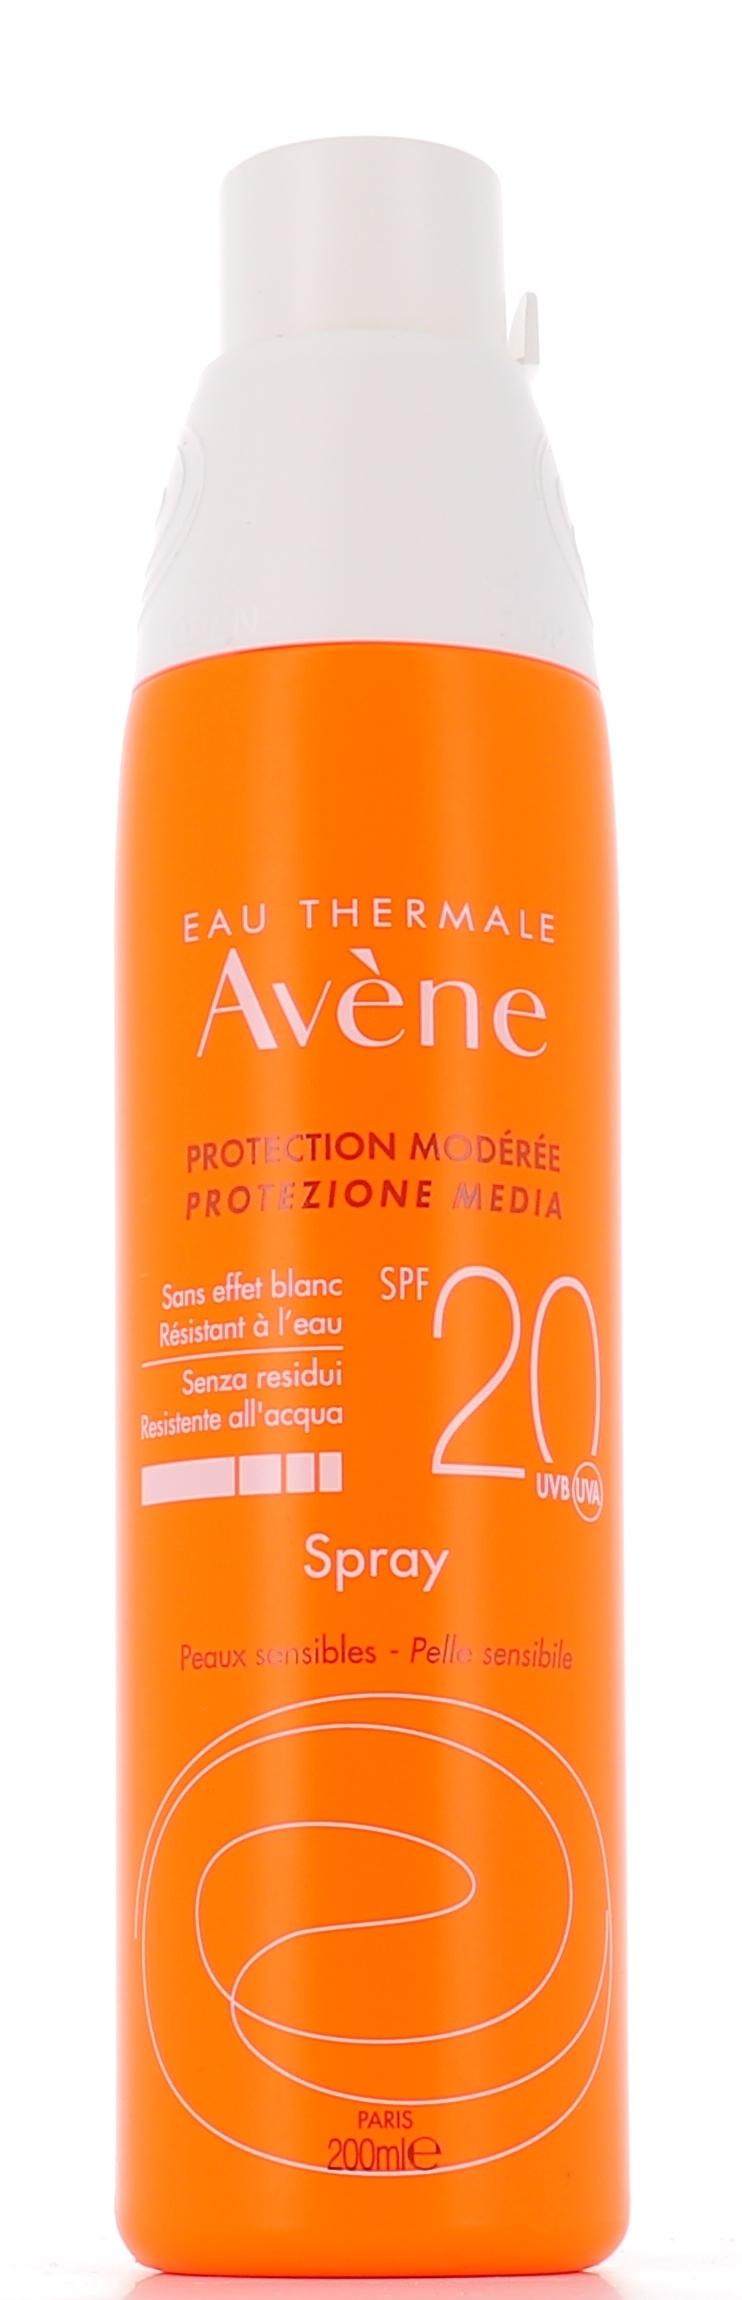 AVENE (Pierre Fabre It. SpA) Avene Solare Spray Corpo Spf20 200ml